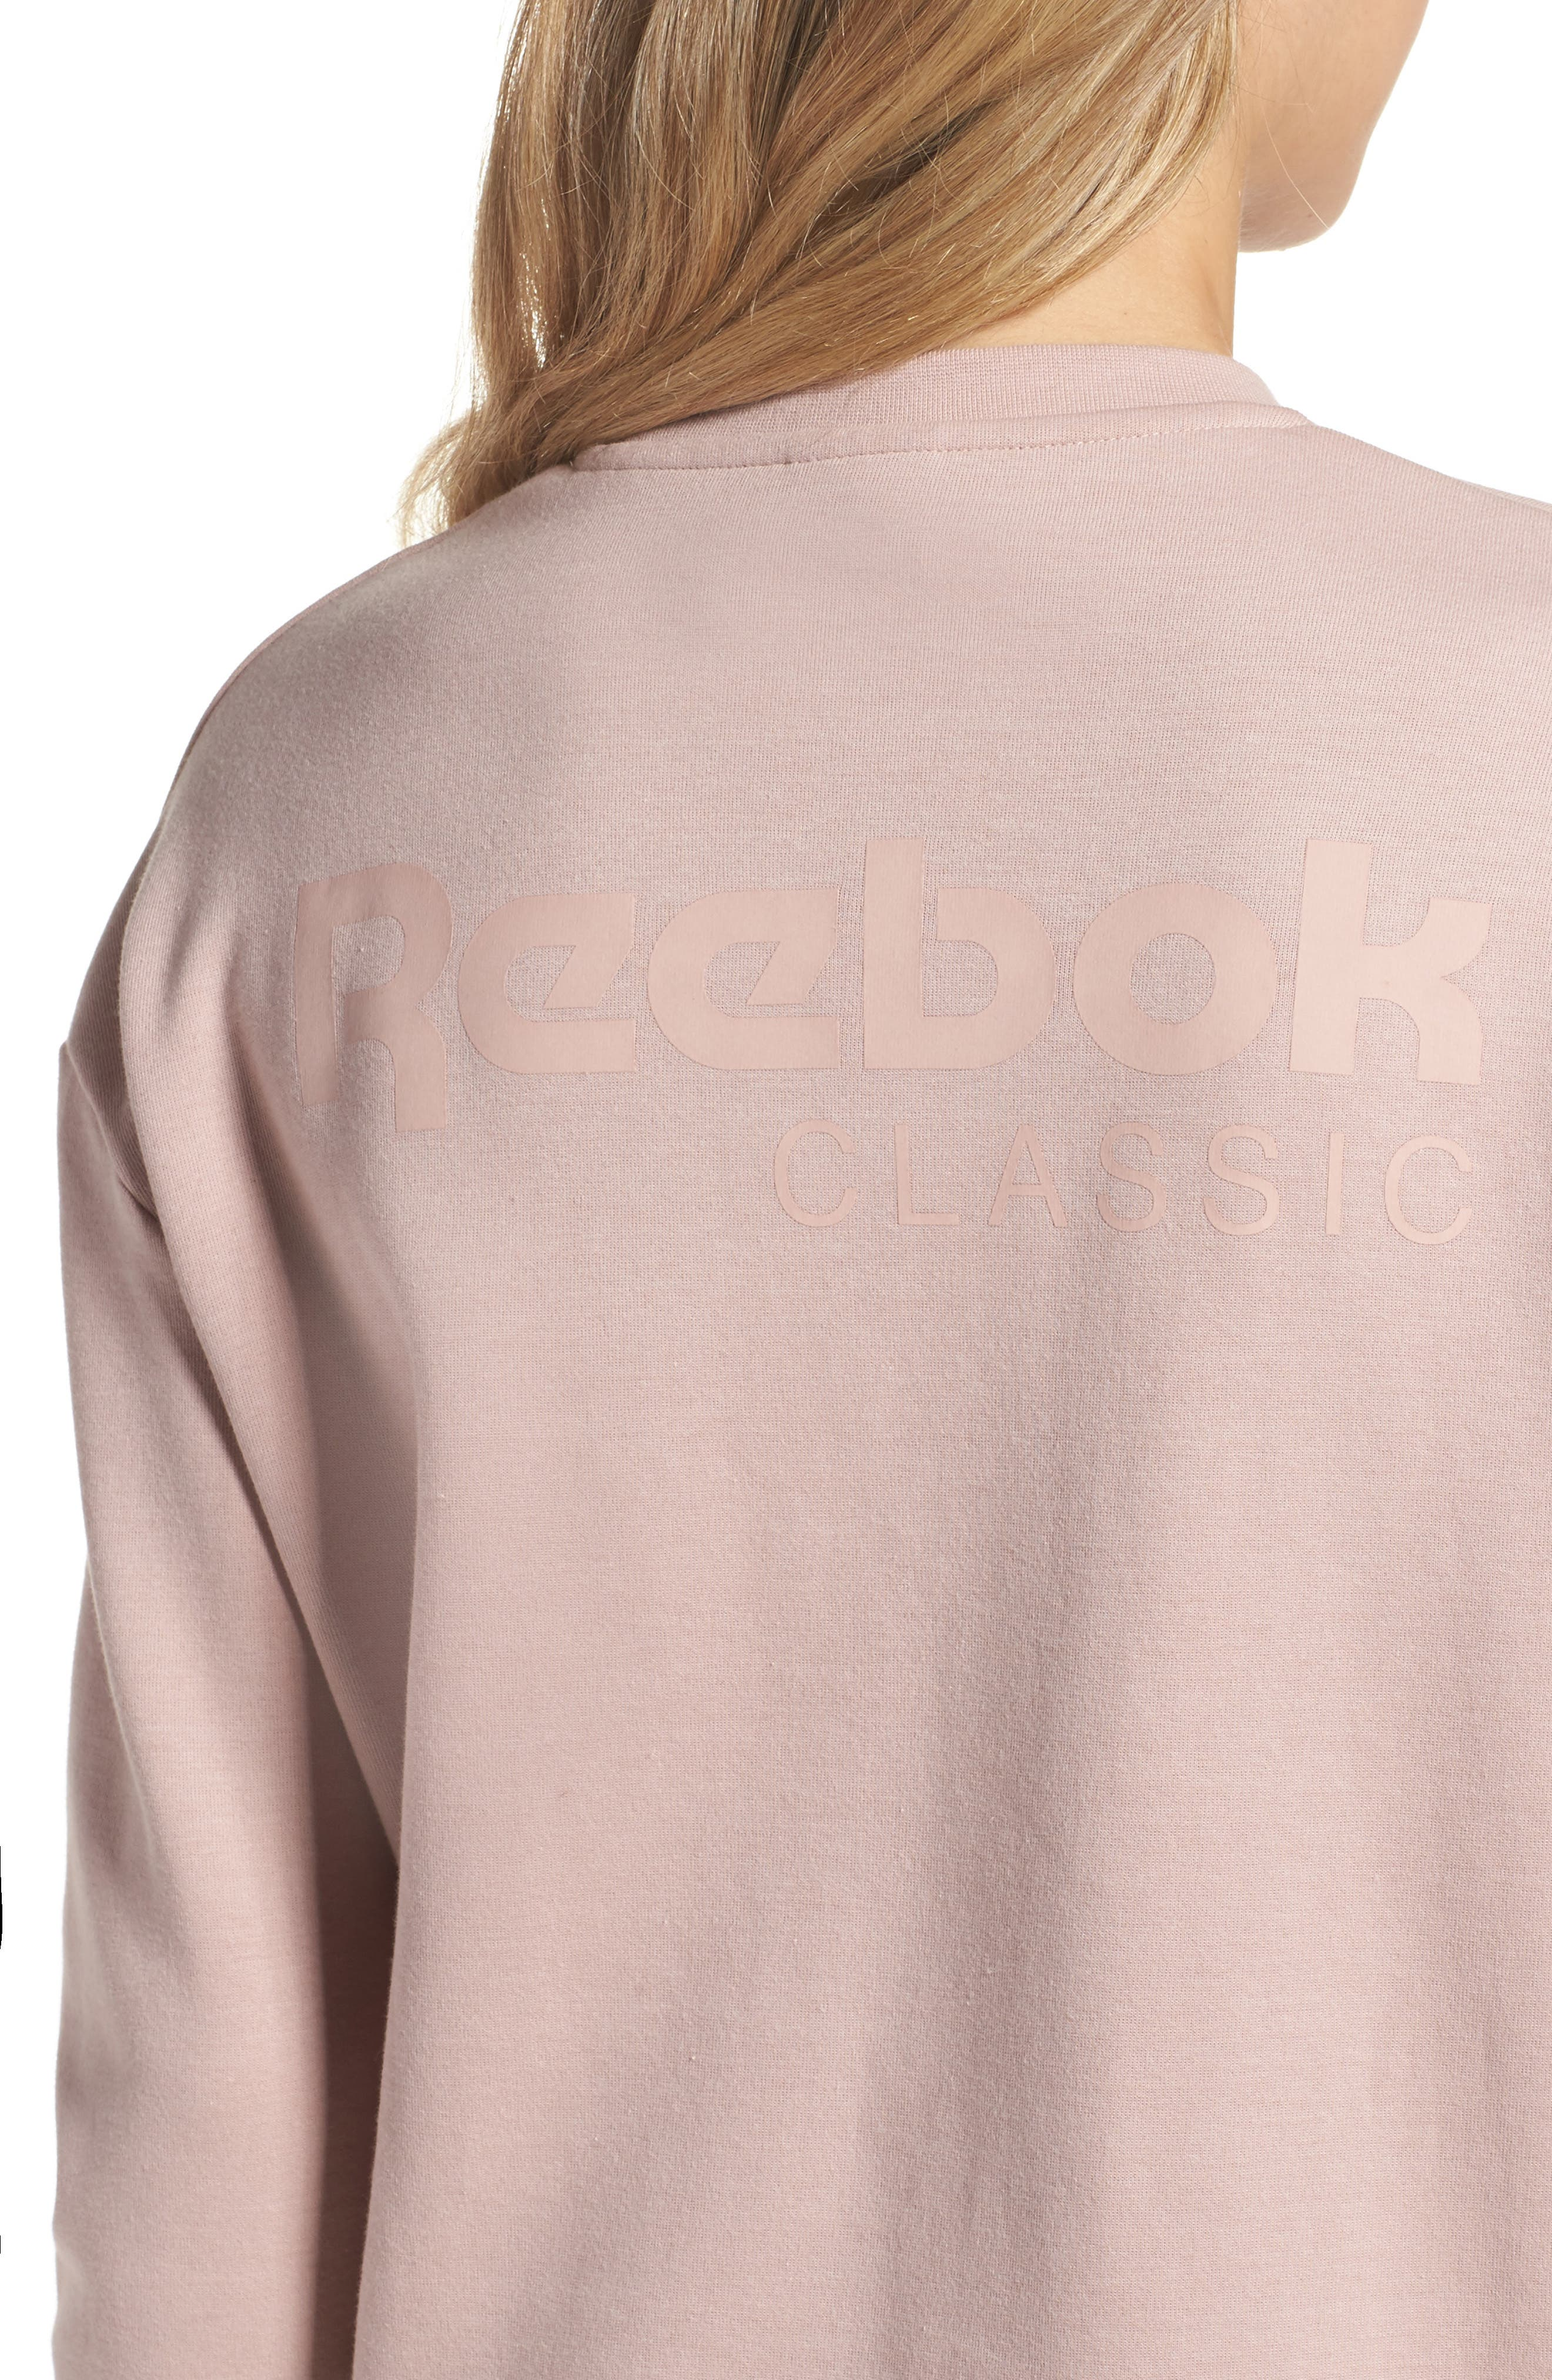 Oversized Sweatshirt,                             Alternate thumbnail 4, color,                             Shell Pink